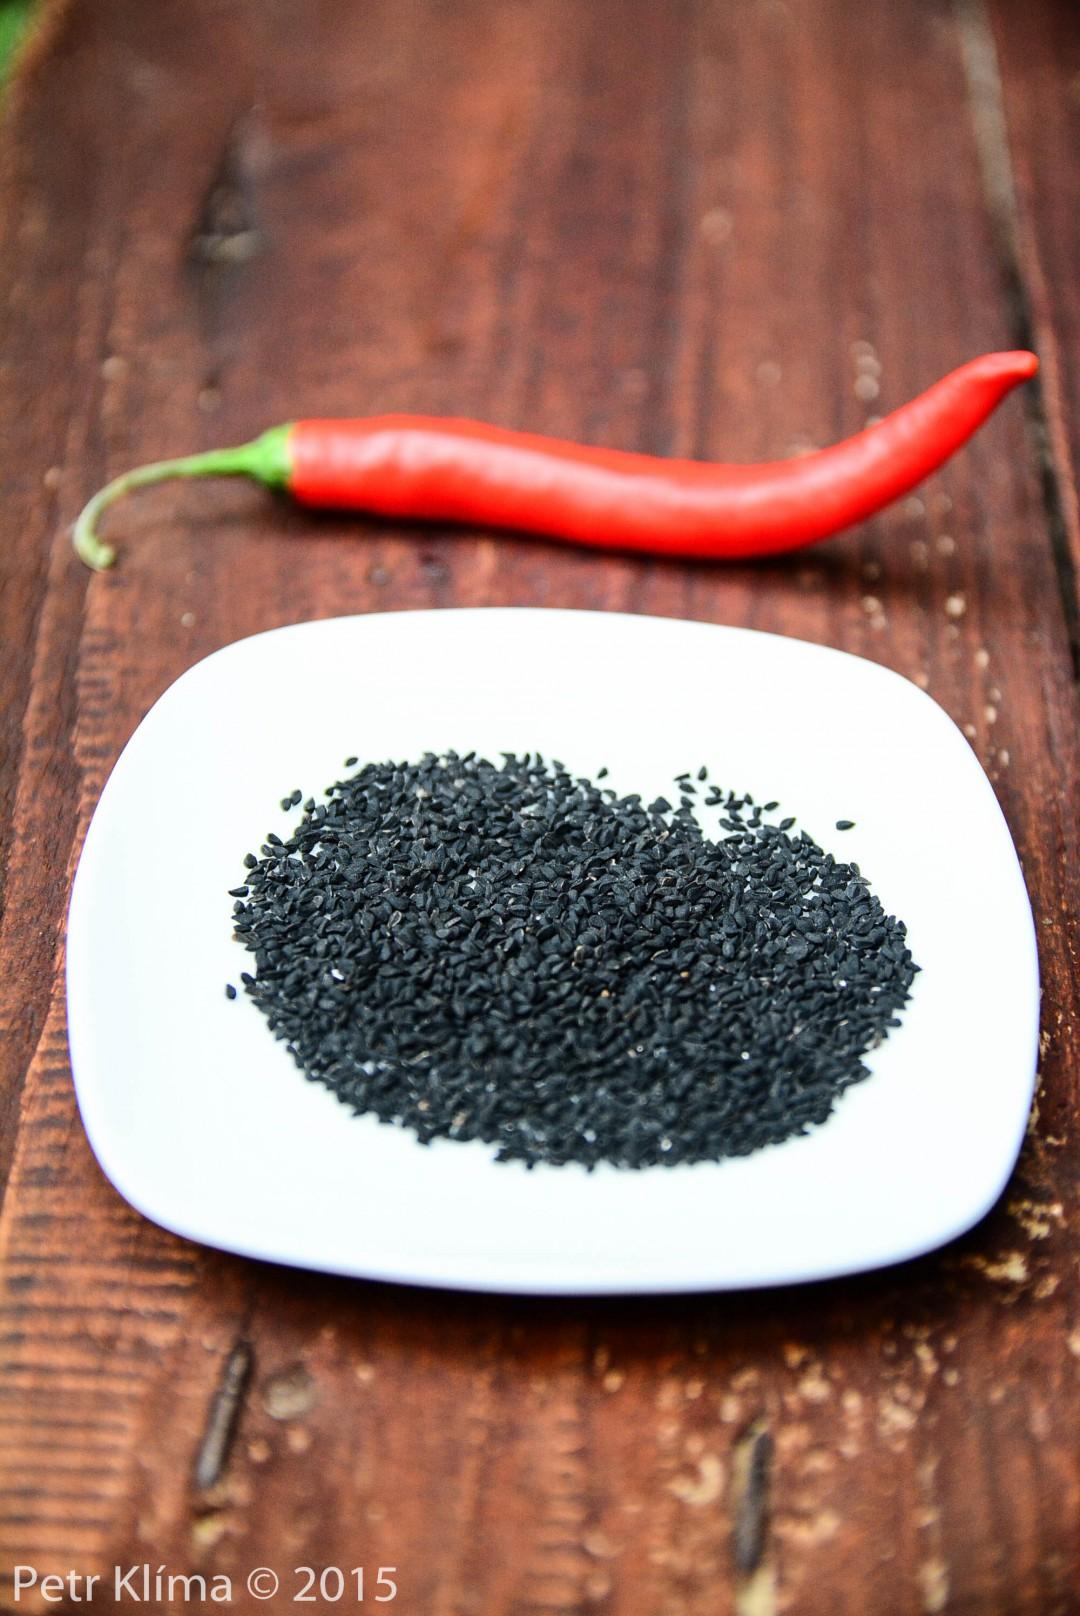 Černucha setá/ Black onion seeds